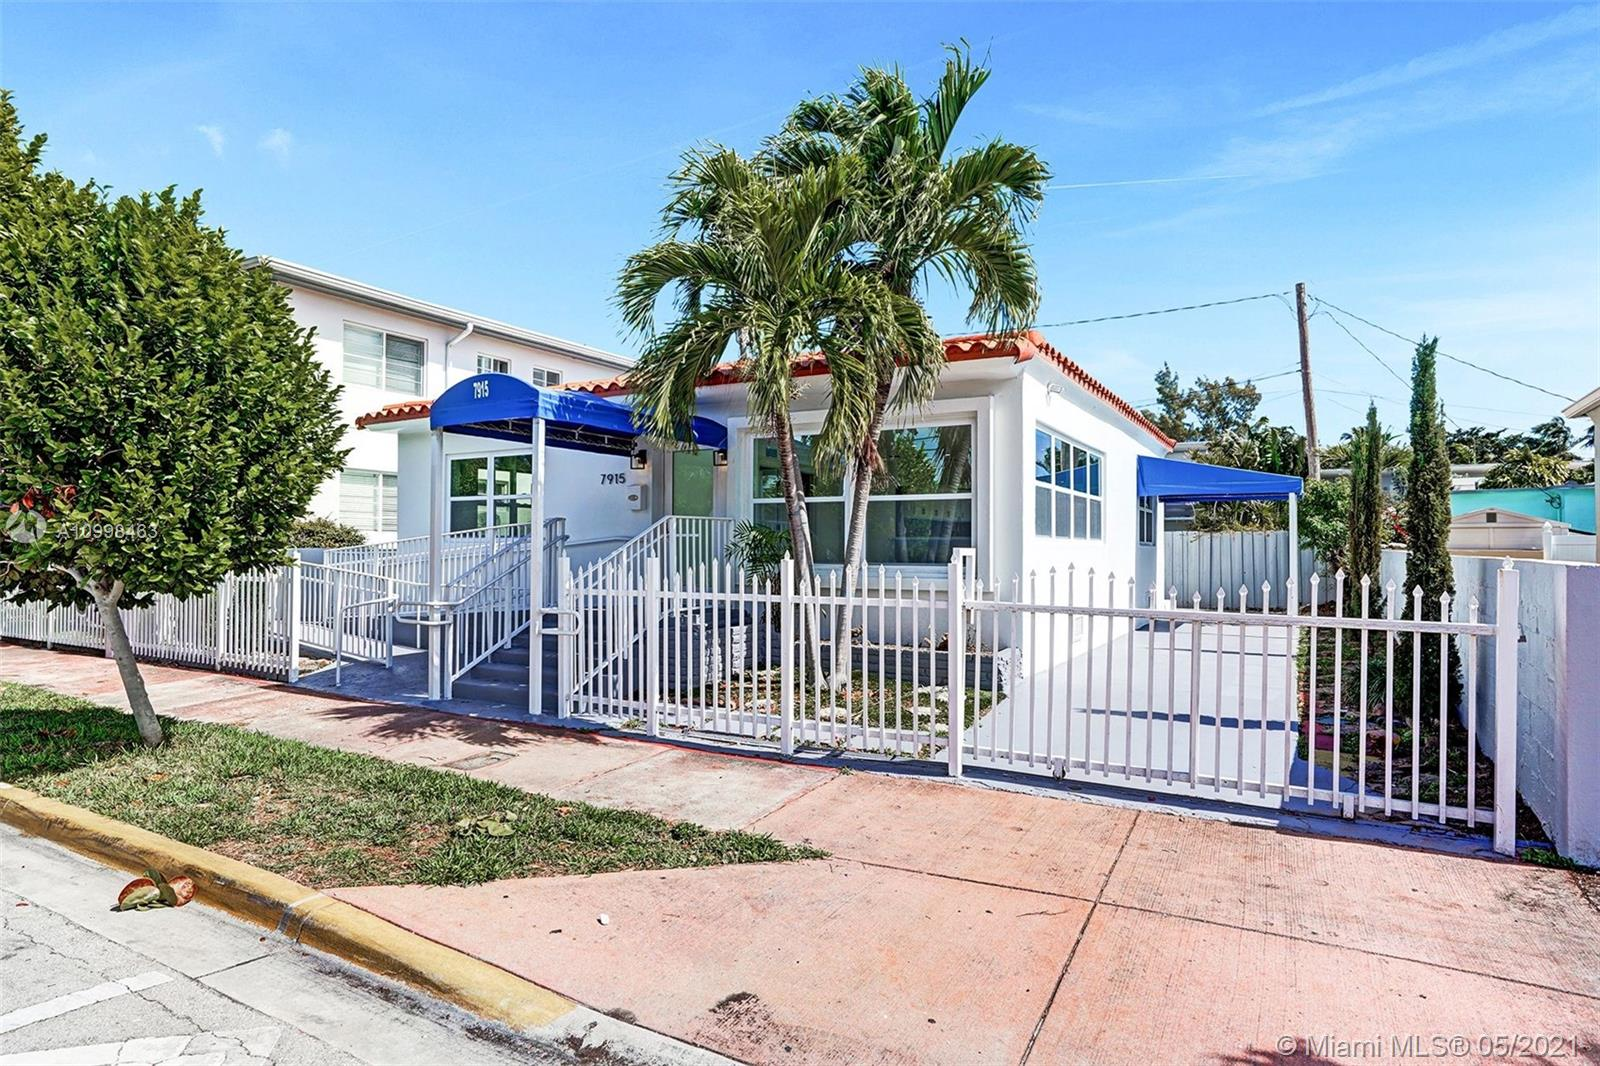 Biscayne Beach - 7915 Hawthorne Ave, Miami Beach, FL 33141